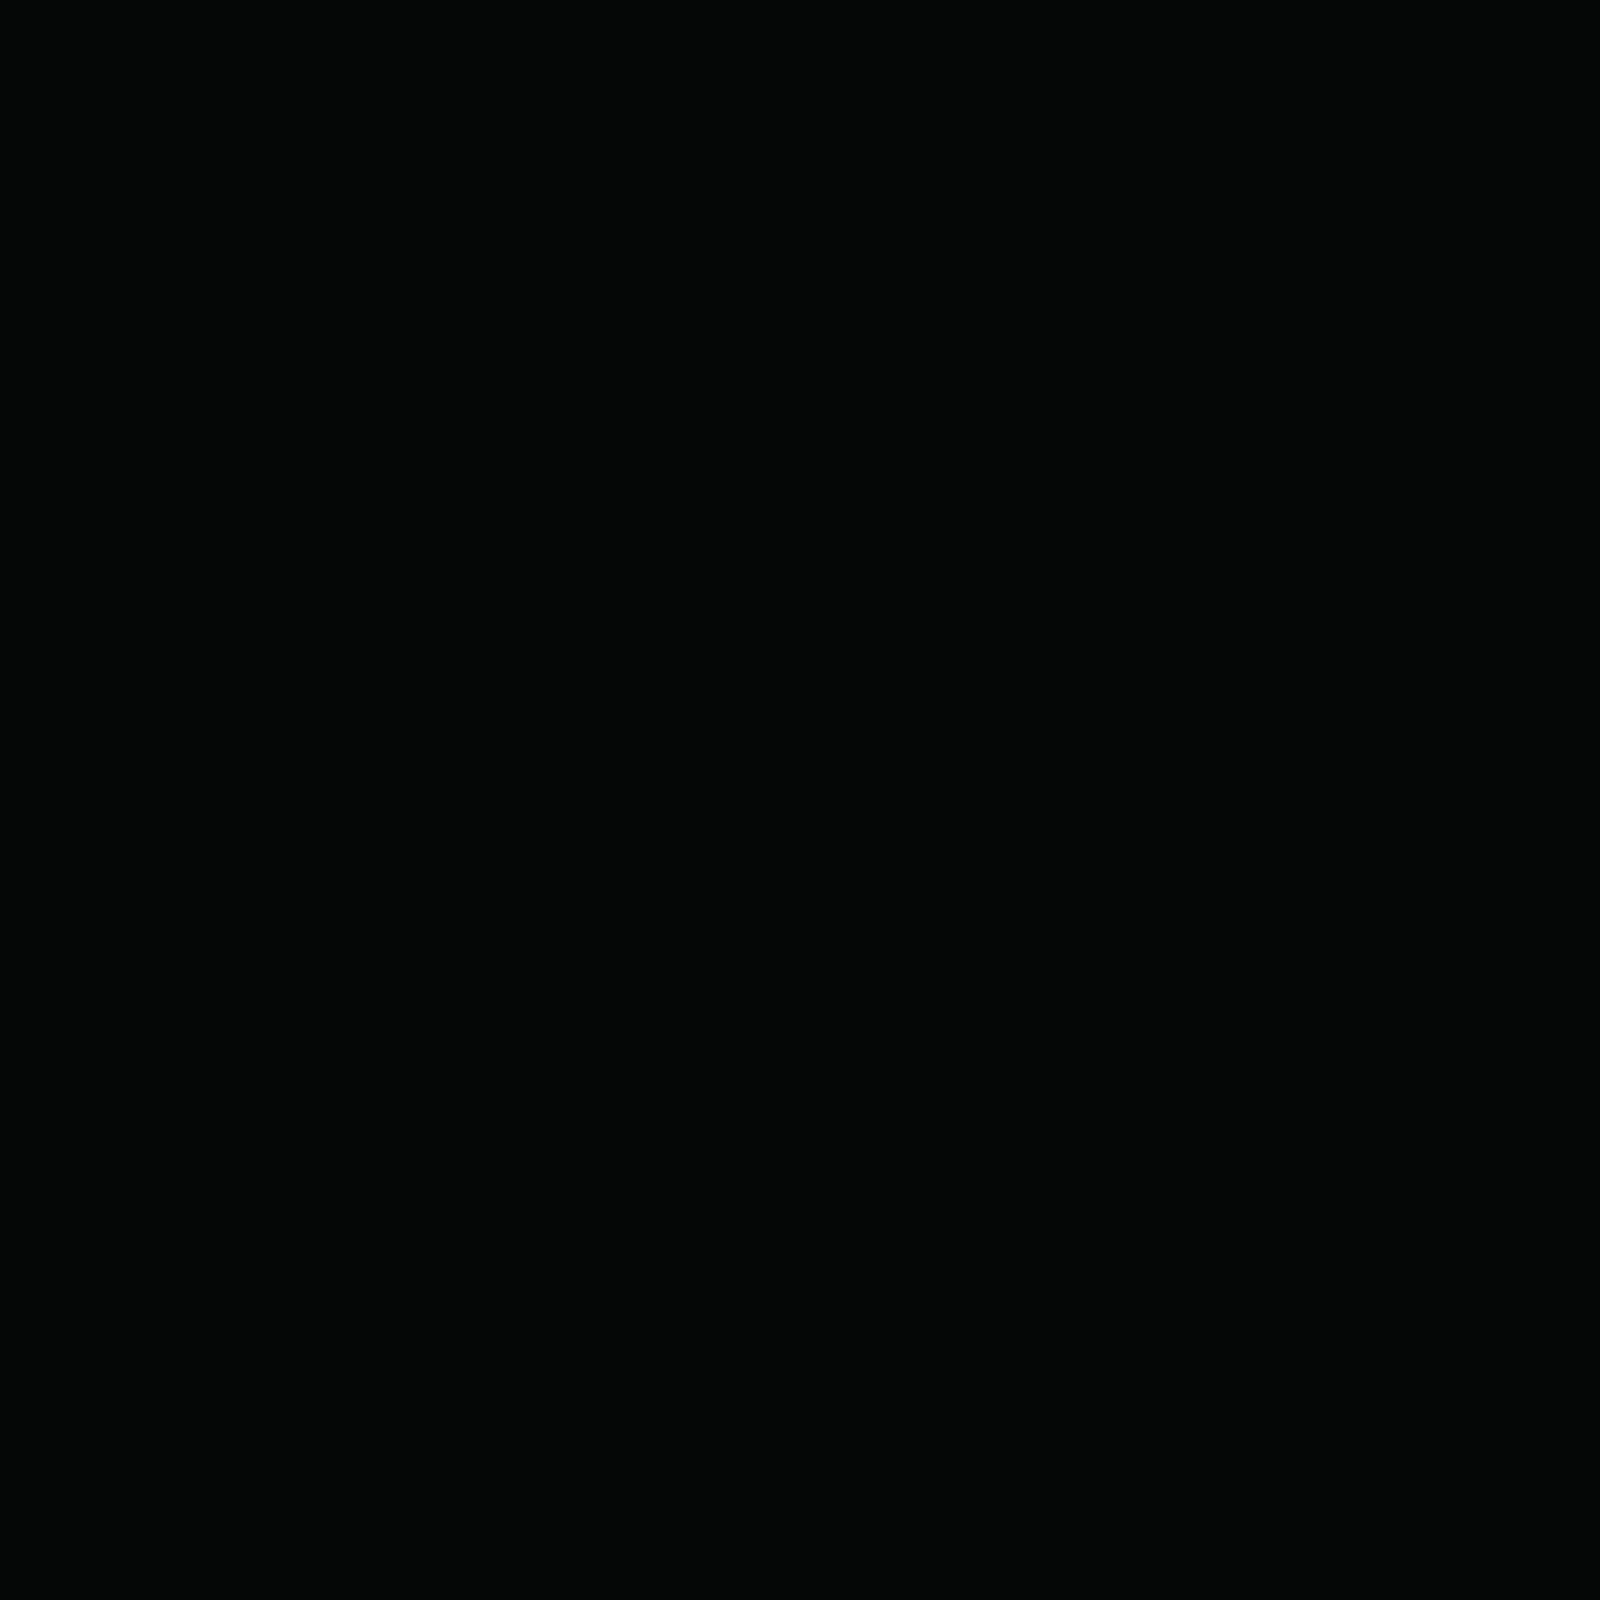 d-c fix Klebefolie - schwarz - 90x210 cm